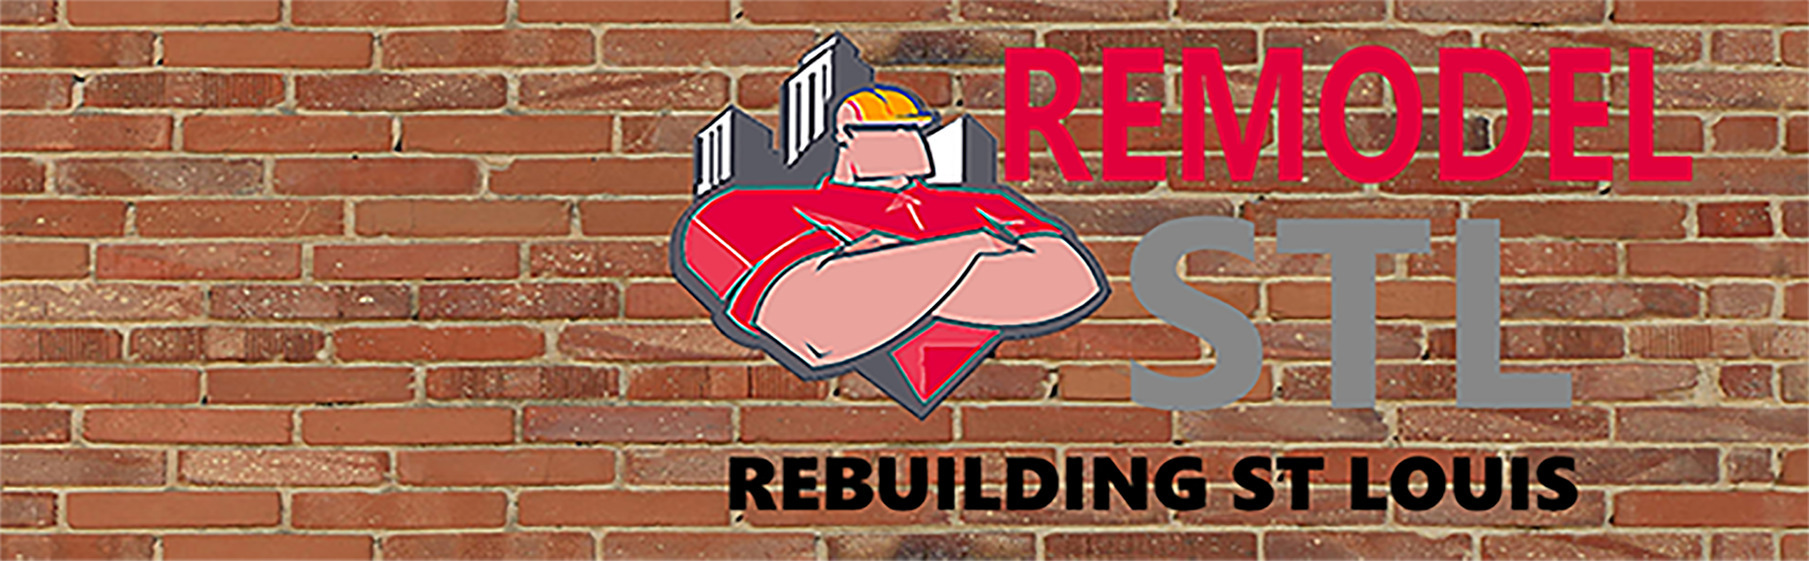 Remodel STL - 1 REMODEL (@construction) Cover Image